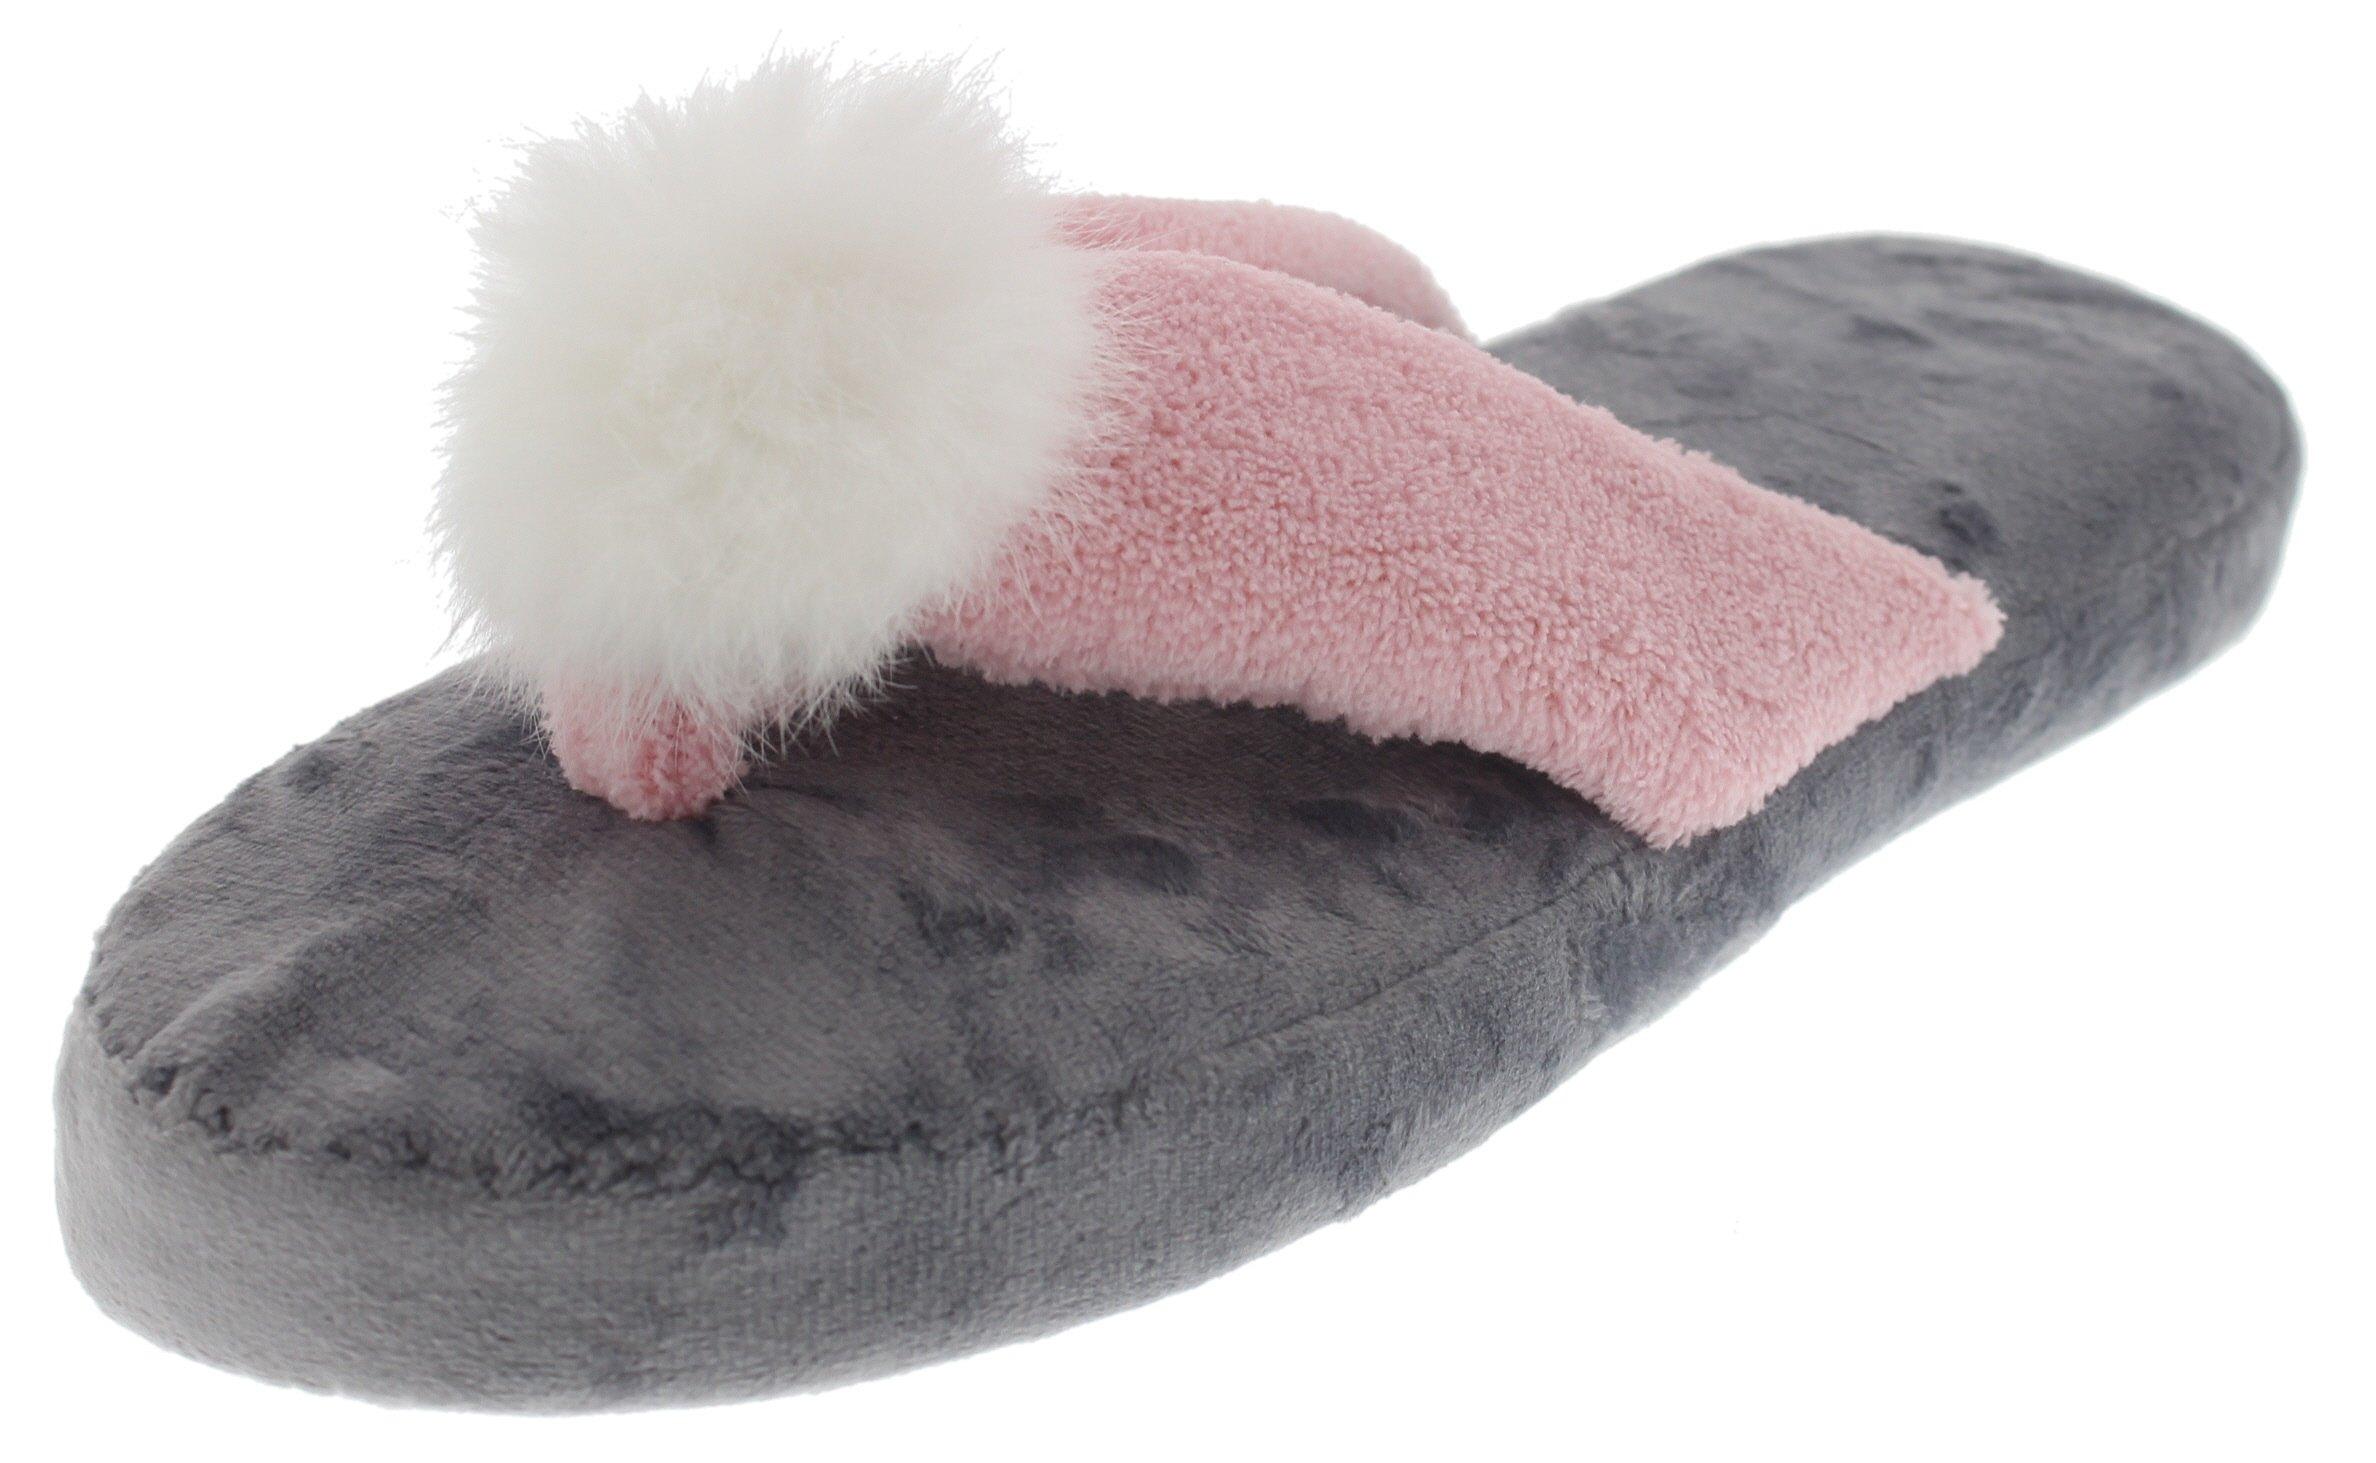 Violet & Virtue Women's Plush Pom-Pom Flip-Flop Slipper (Large 9-10, Pink & Grey)